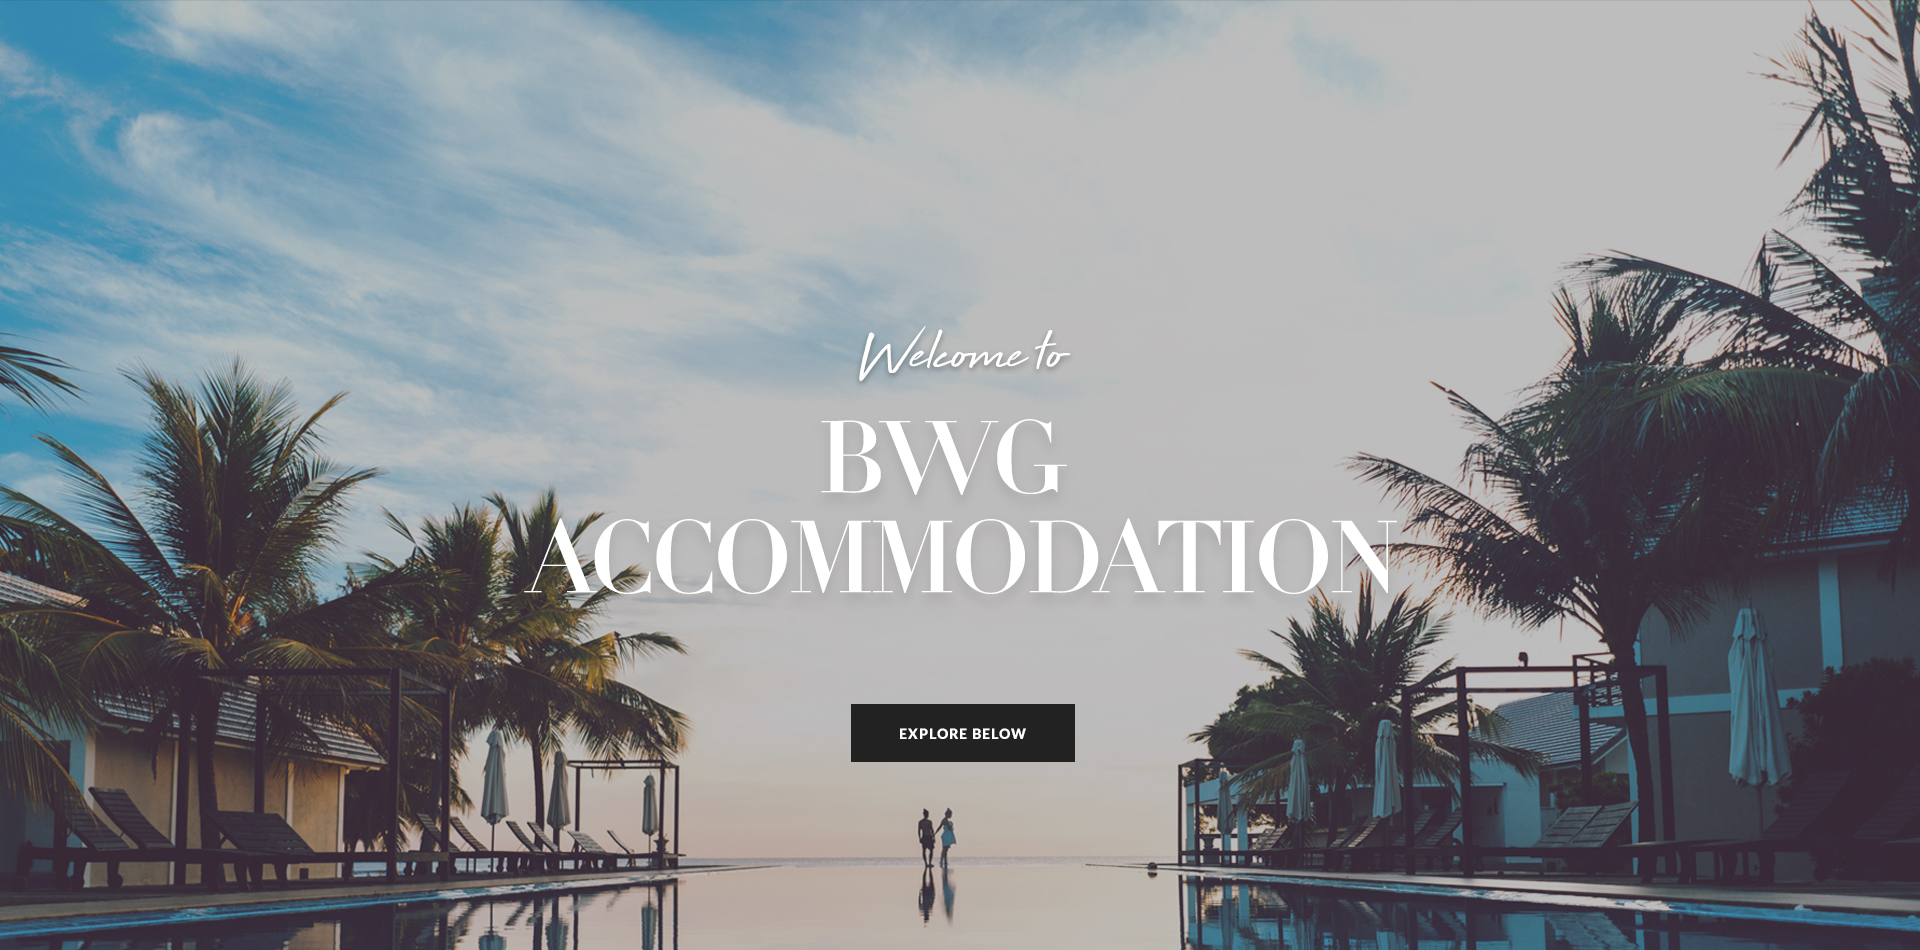 accommodation-main-banner.jpg